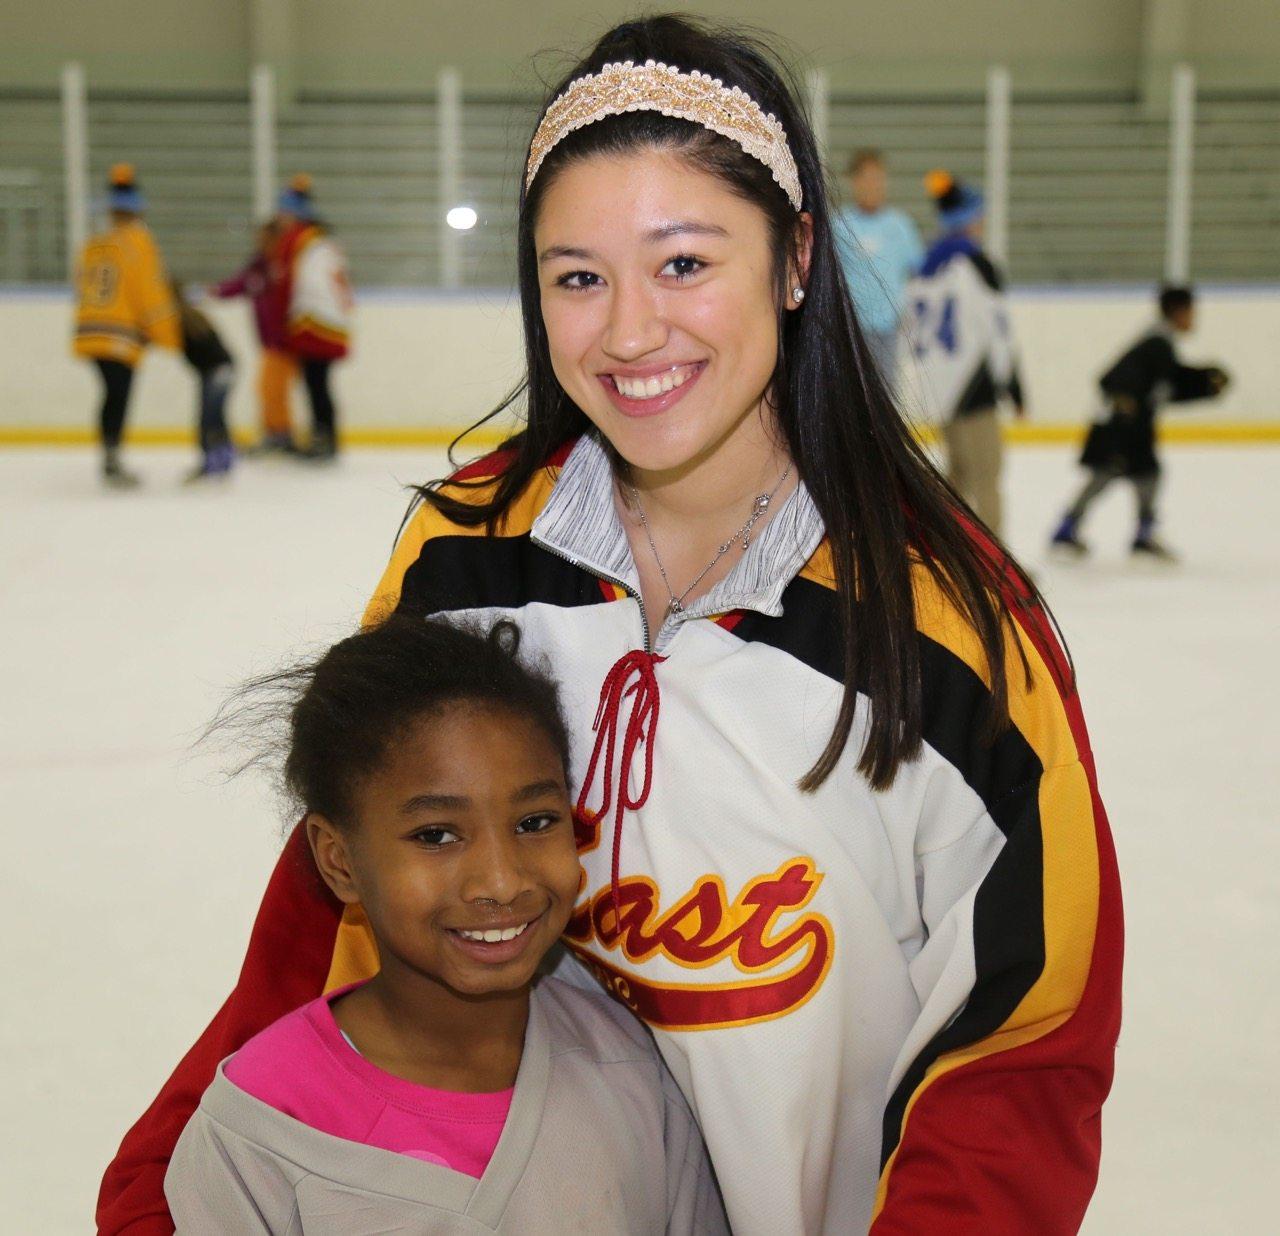 East skaters